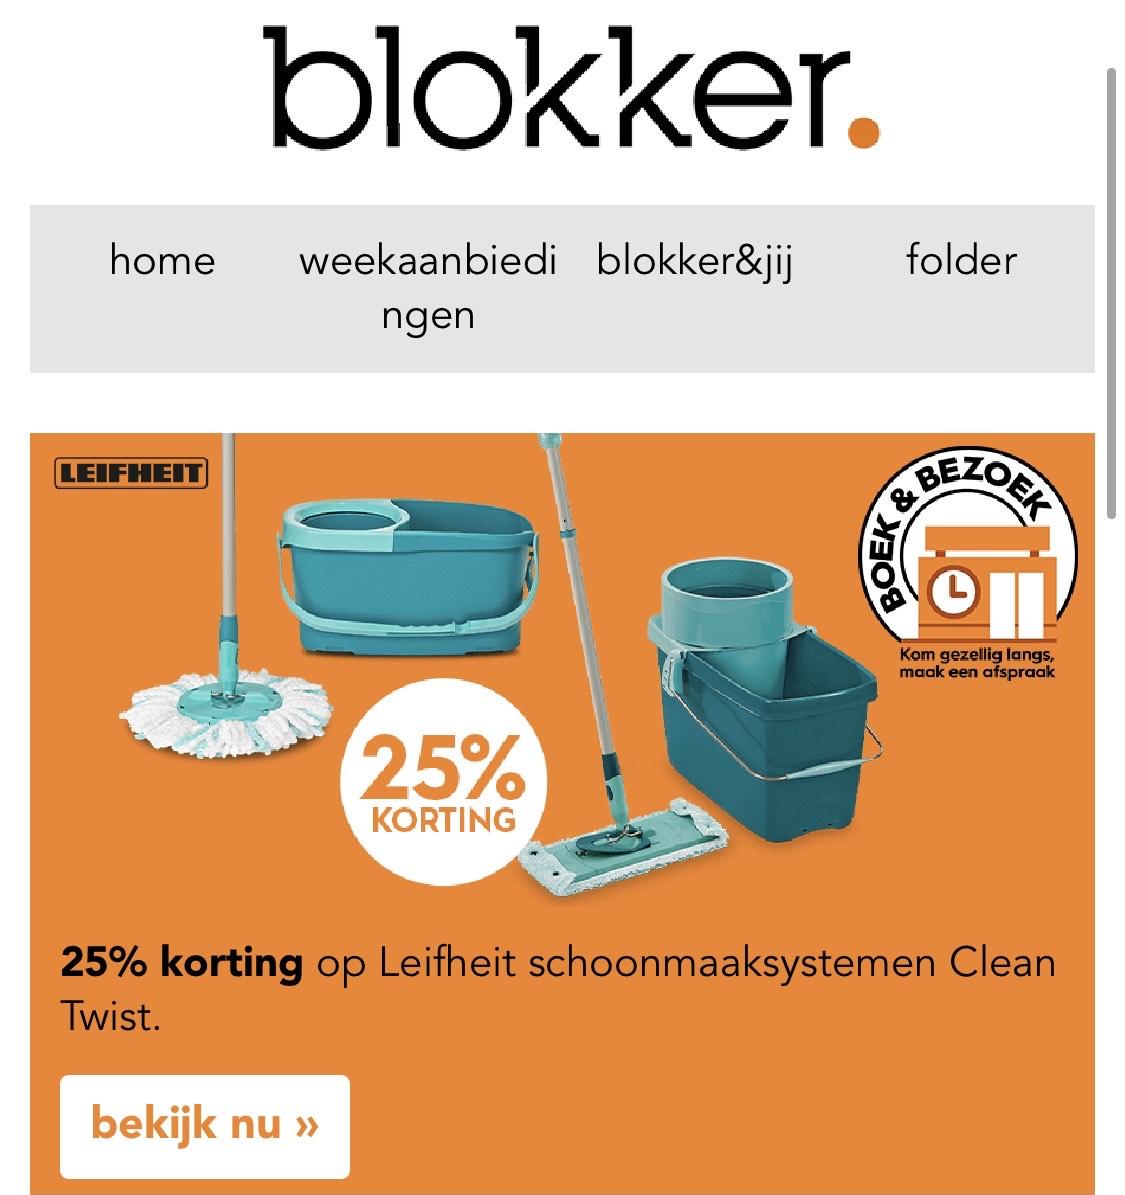 25% korting op Leifheit schoonmaaksystemen Clean Twist